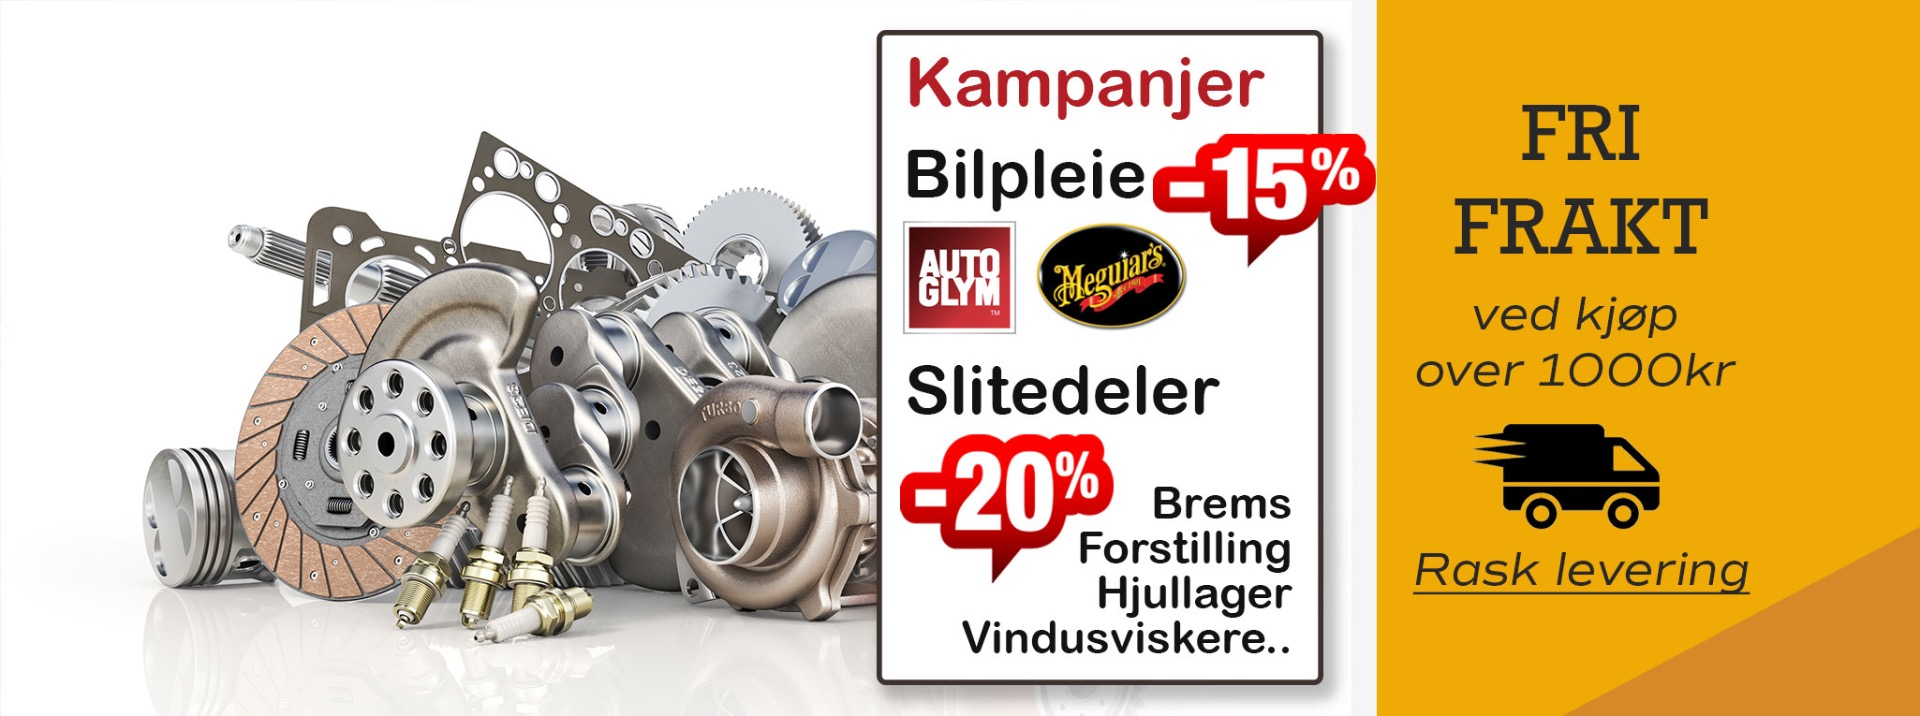 Banner med info om fri frakt på Norgesdel samt Gode tilbud for ferieklar bil